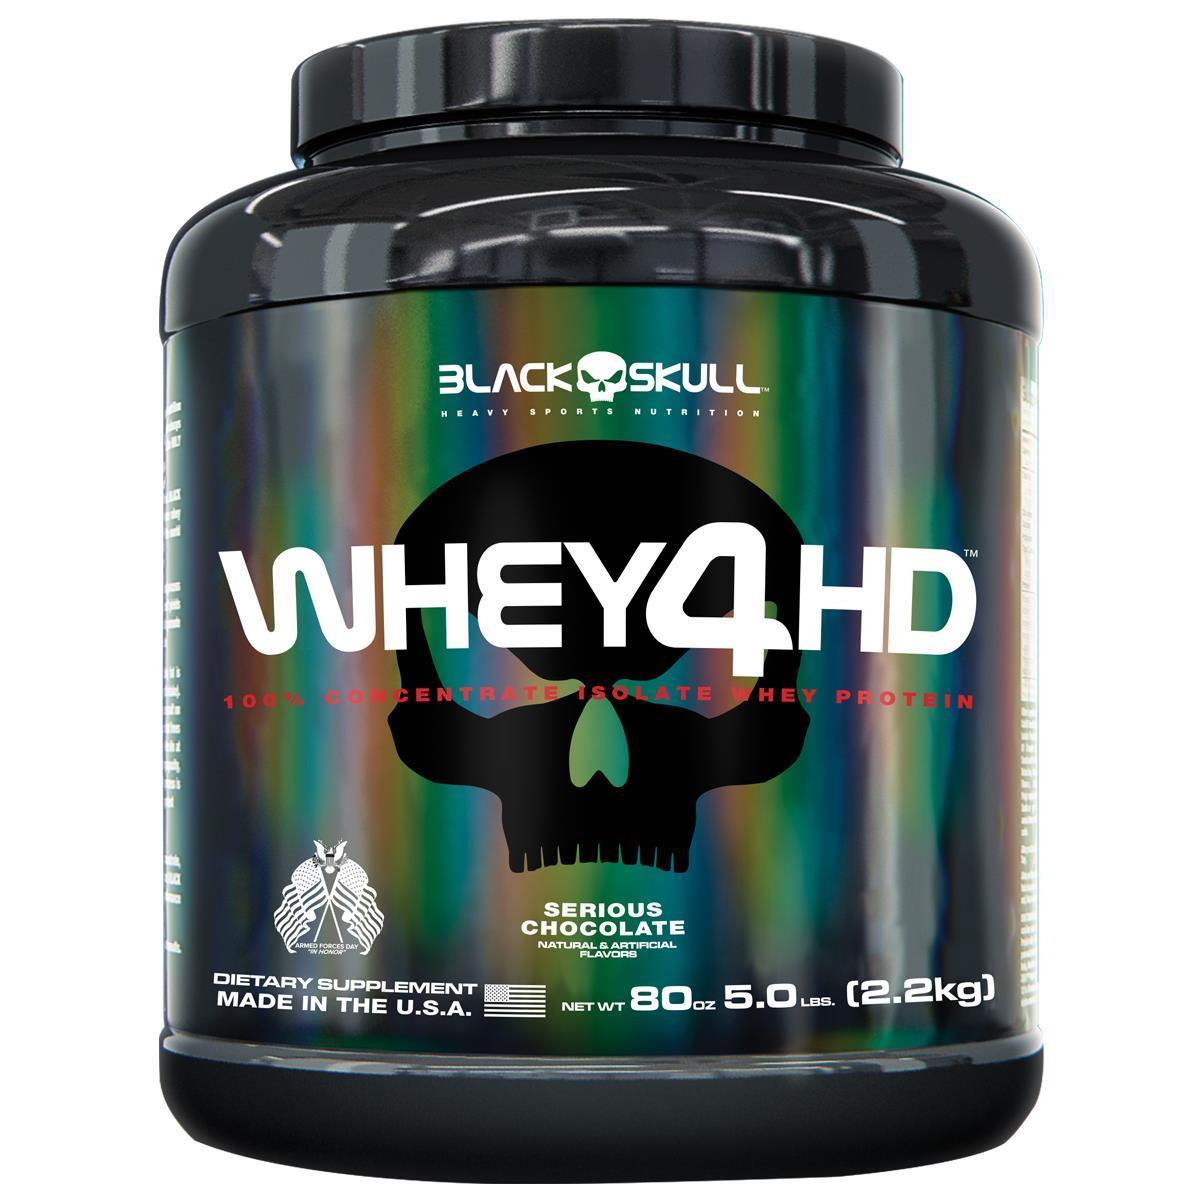 Whey 4HD 2,2 Kg - Black Skull